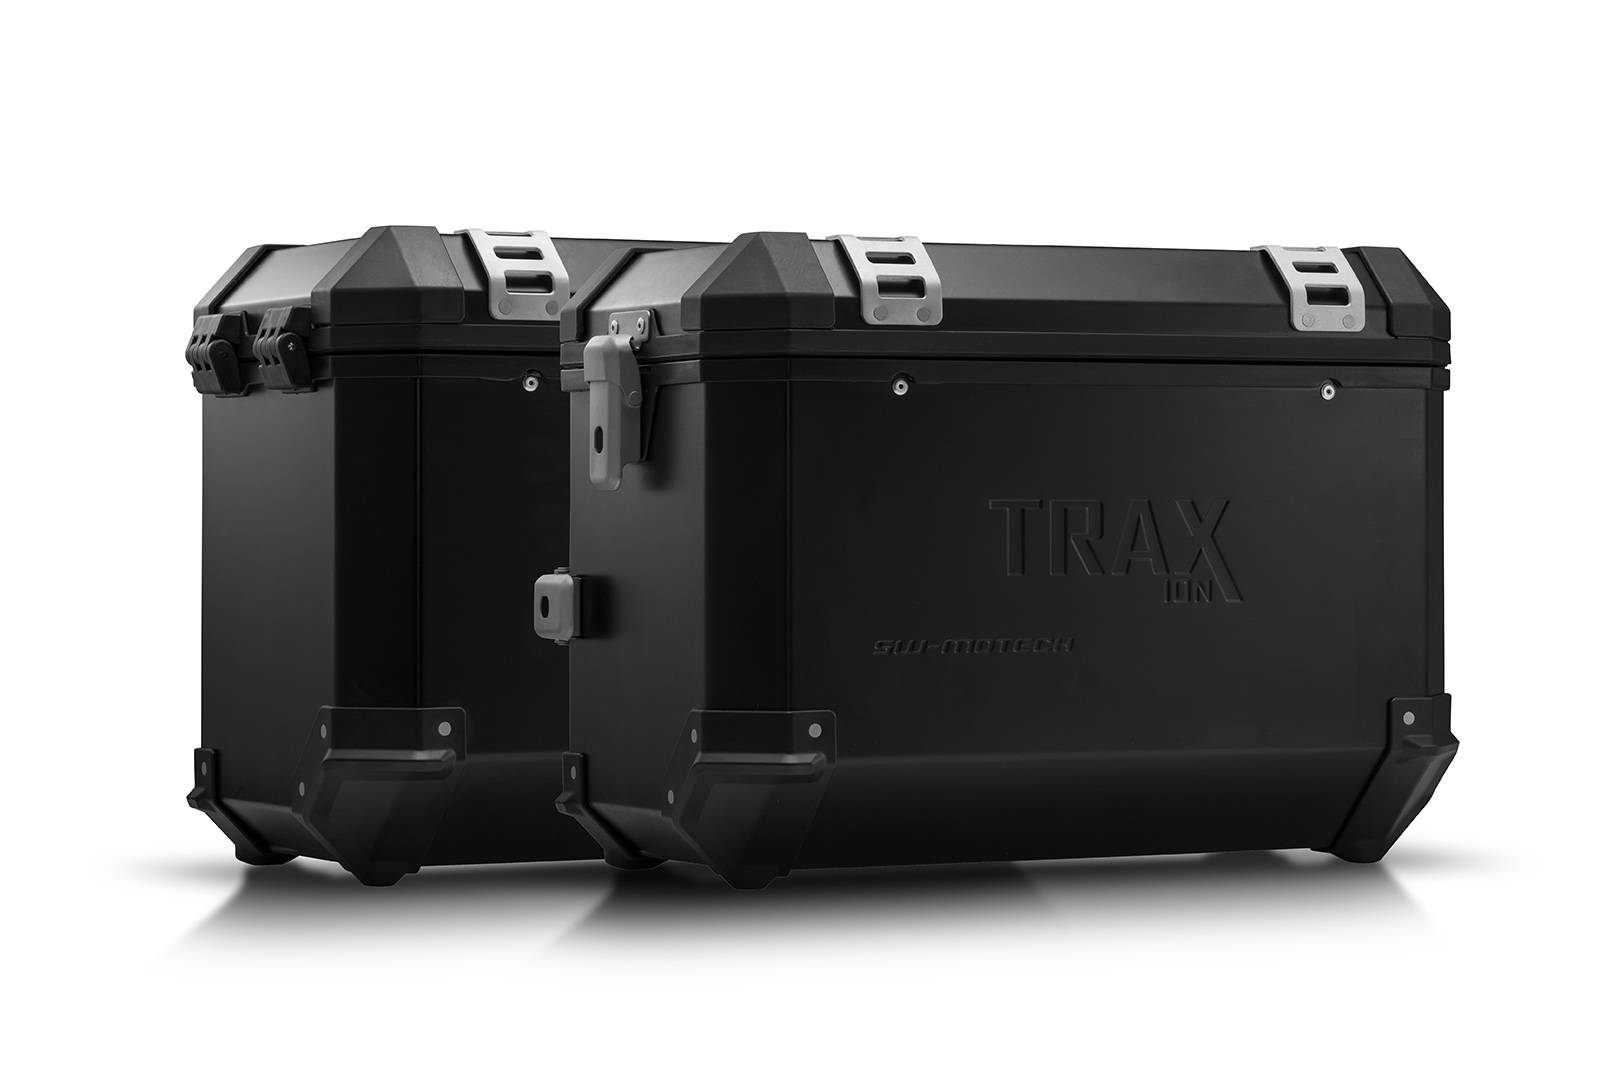 SW-Motech Sistema de maletas TRAX ION - Negro. 45/45 l. Suzuki DL 650 (17-).